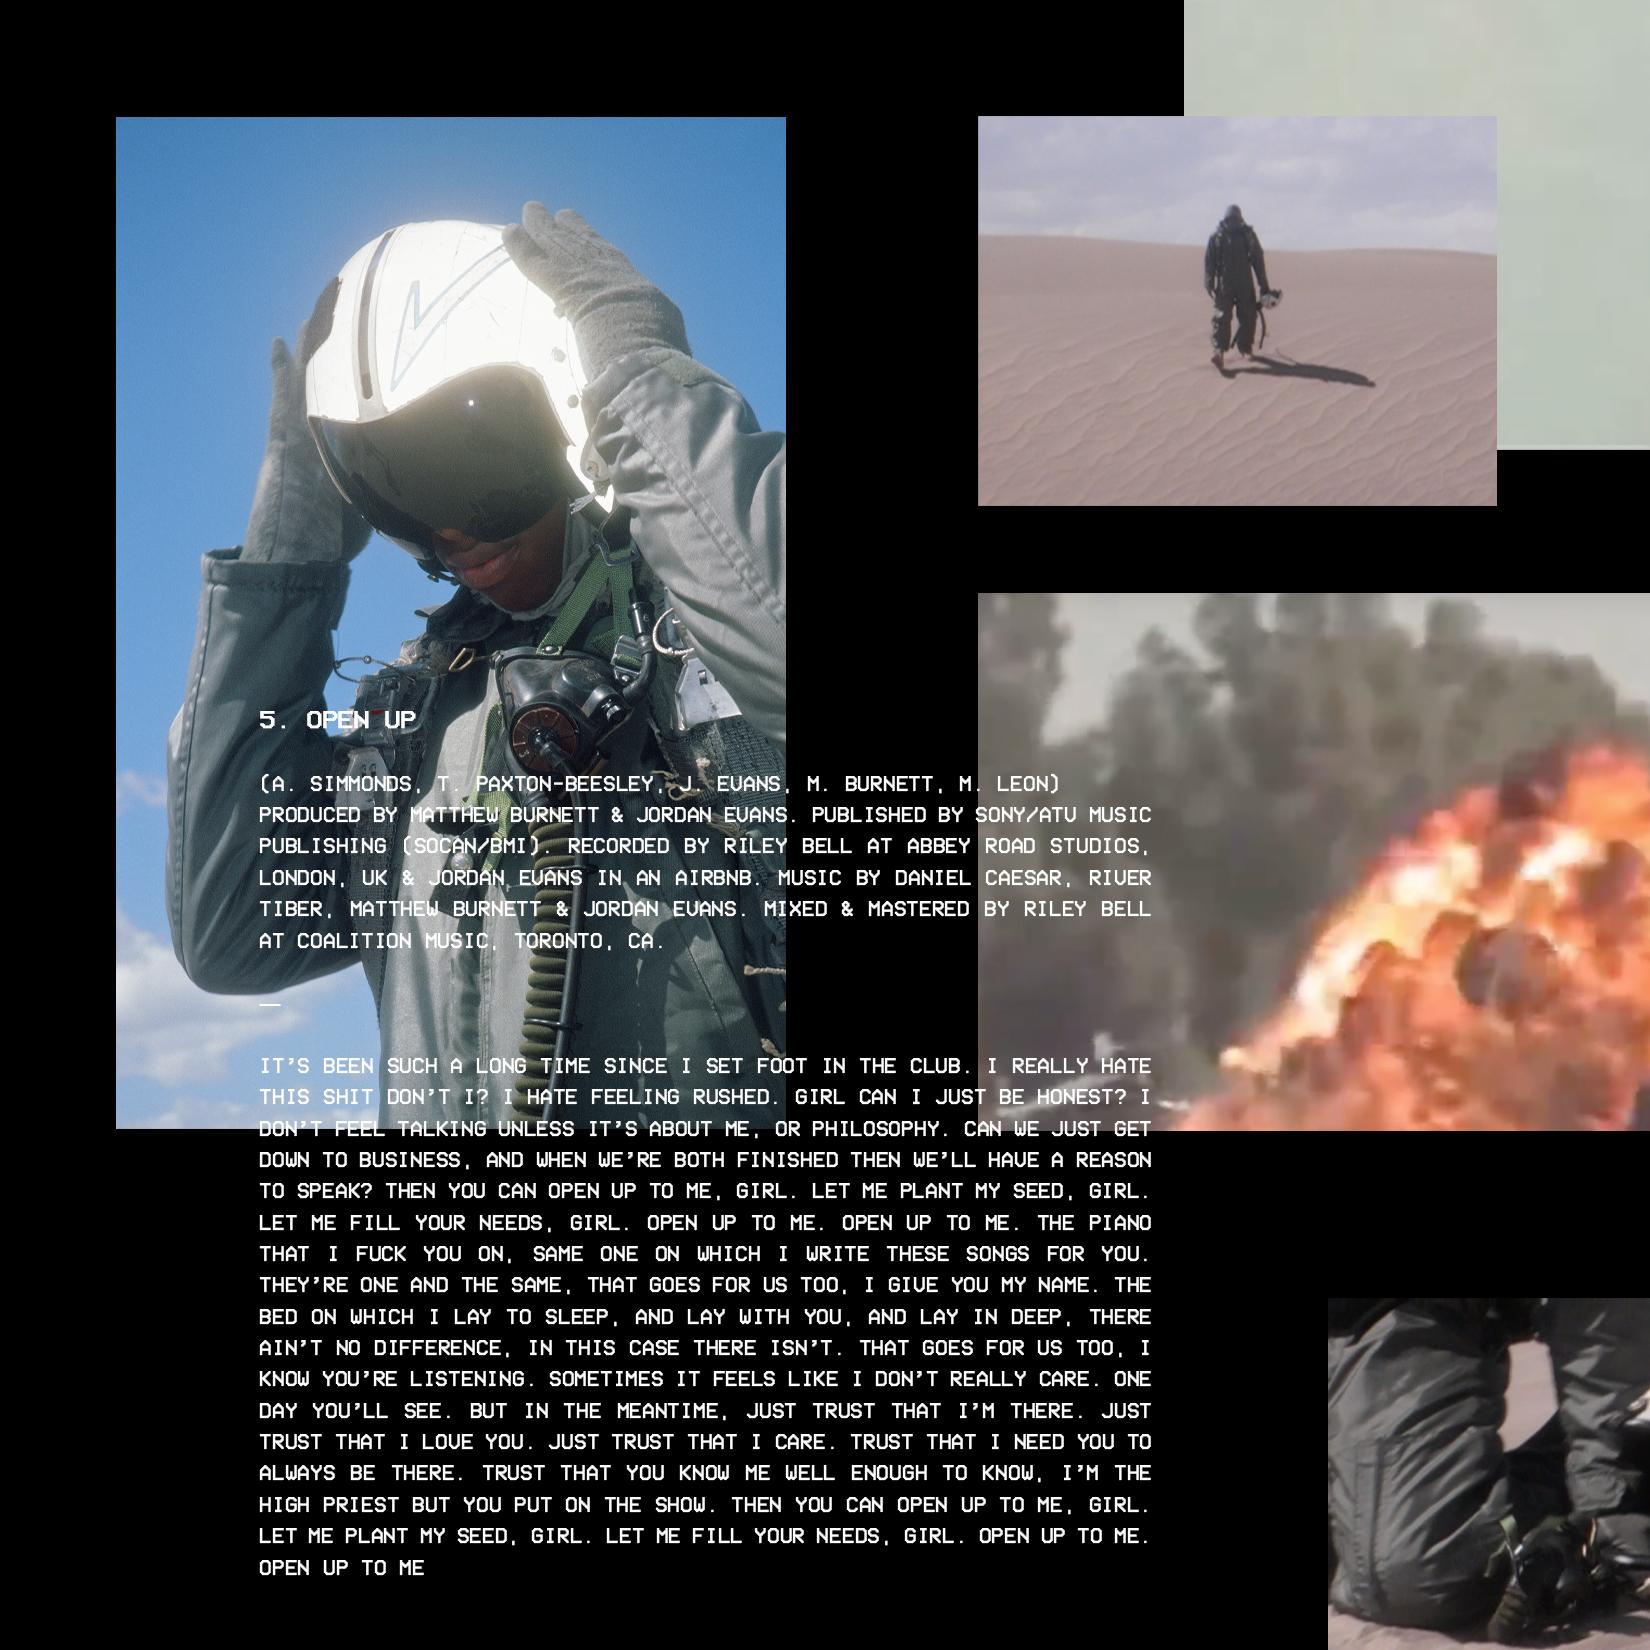 casestudy-linernotes-PG-06.jpg